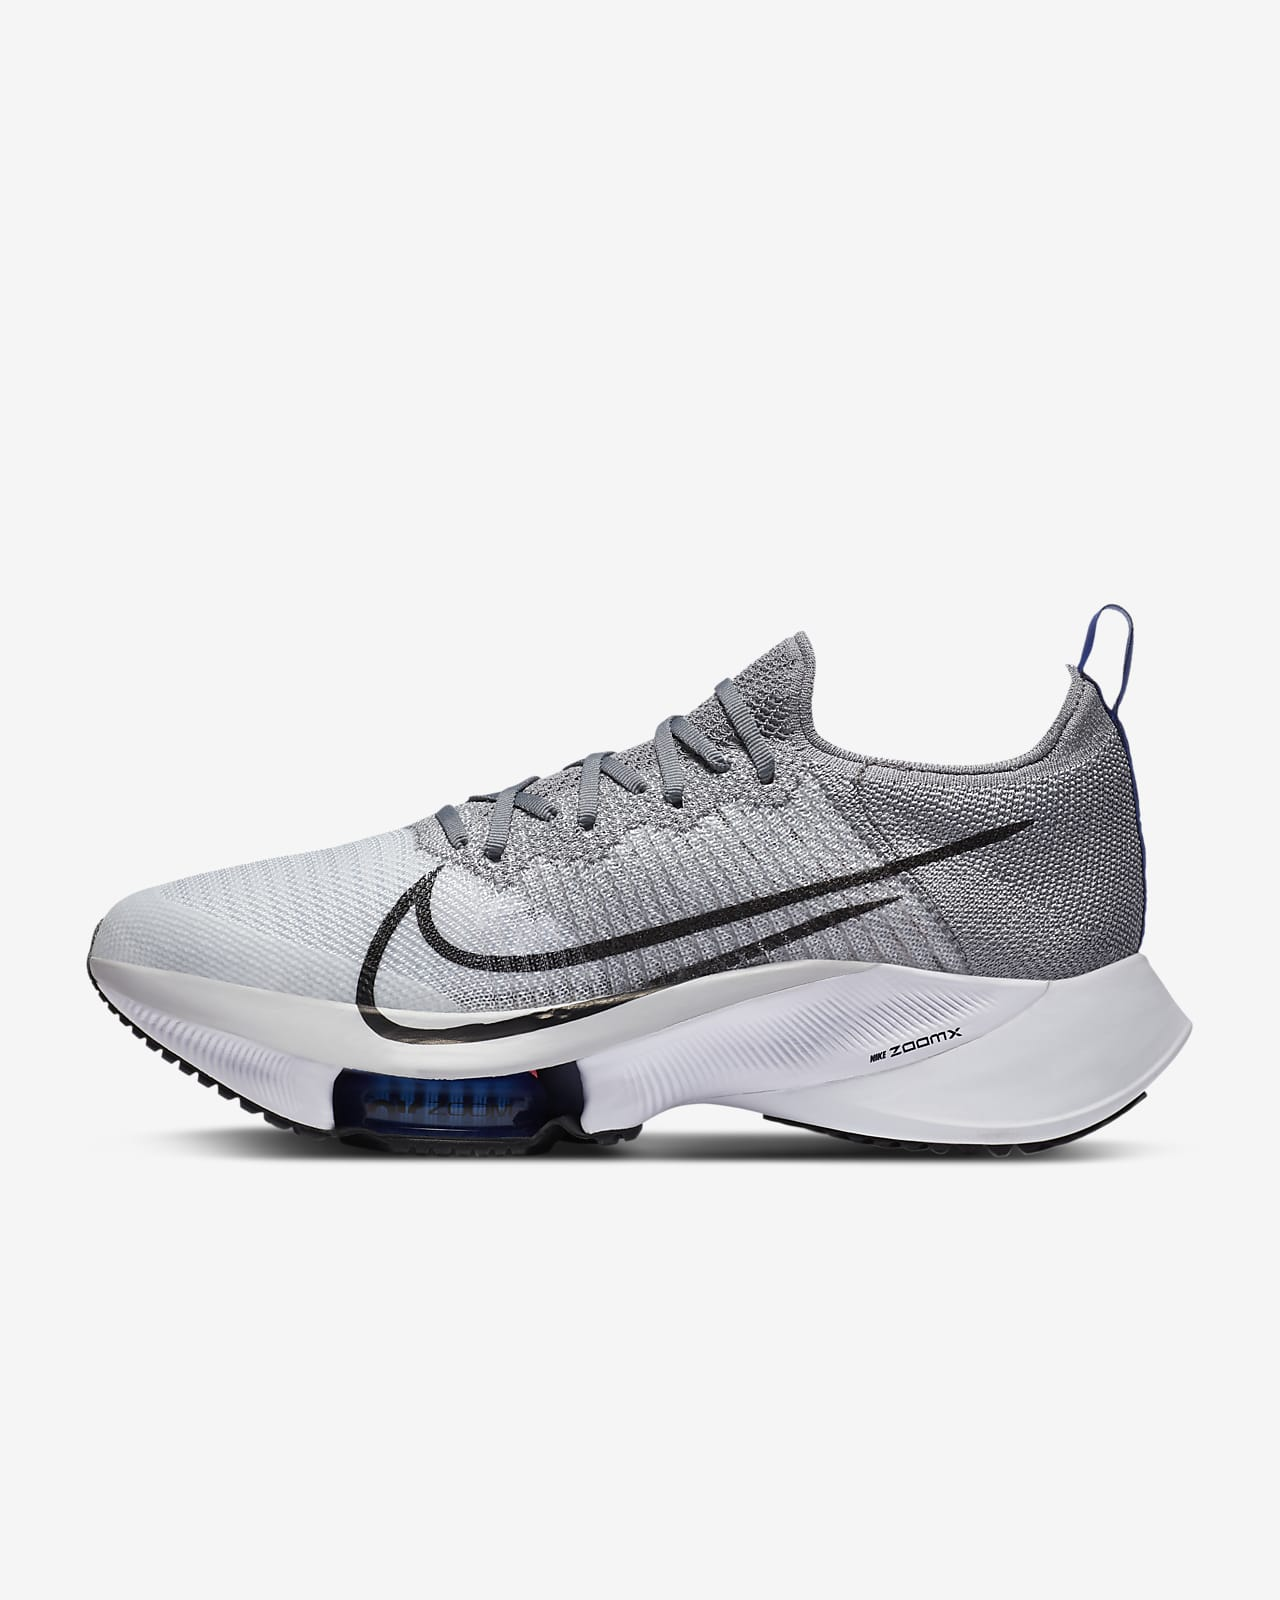 Calzado de running para hombre Nike Air Zoom Tempo NEXT%